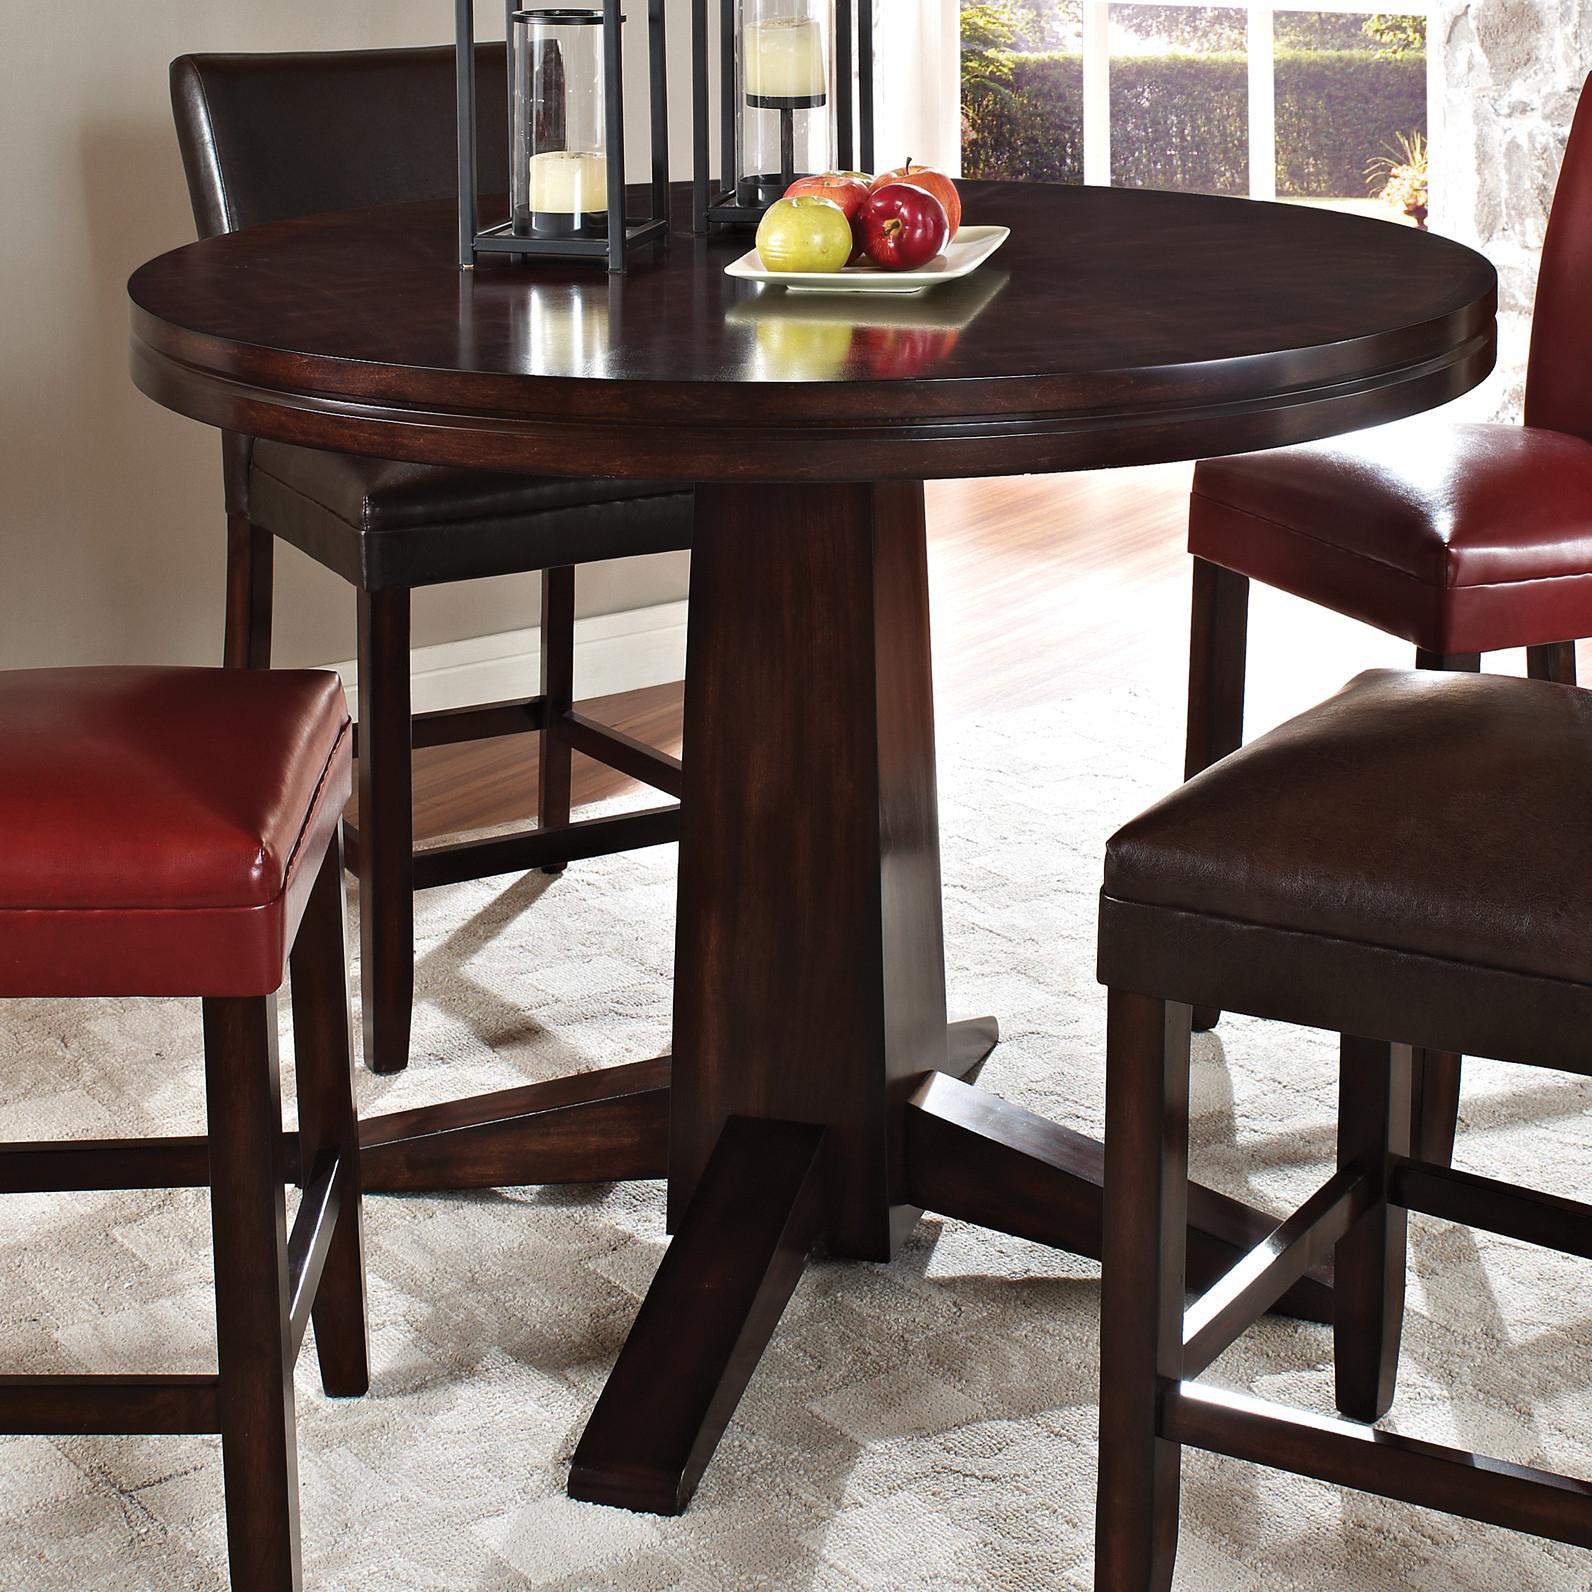 Steve Silver Hartford Counter Table - Item Number: HF480PB+T